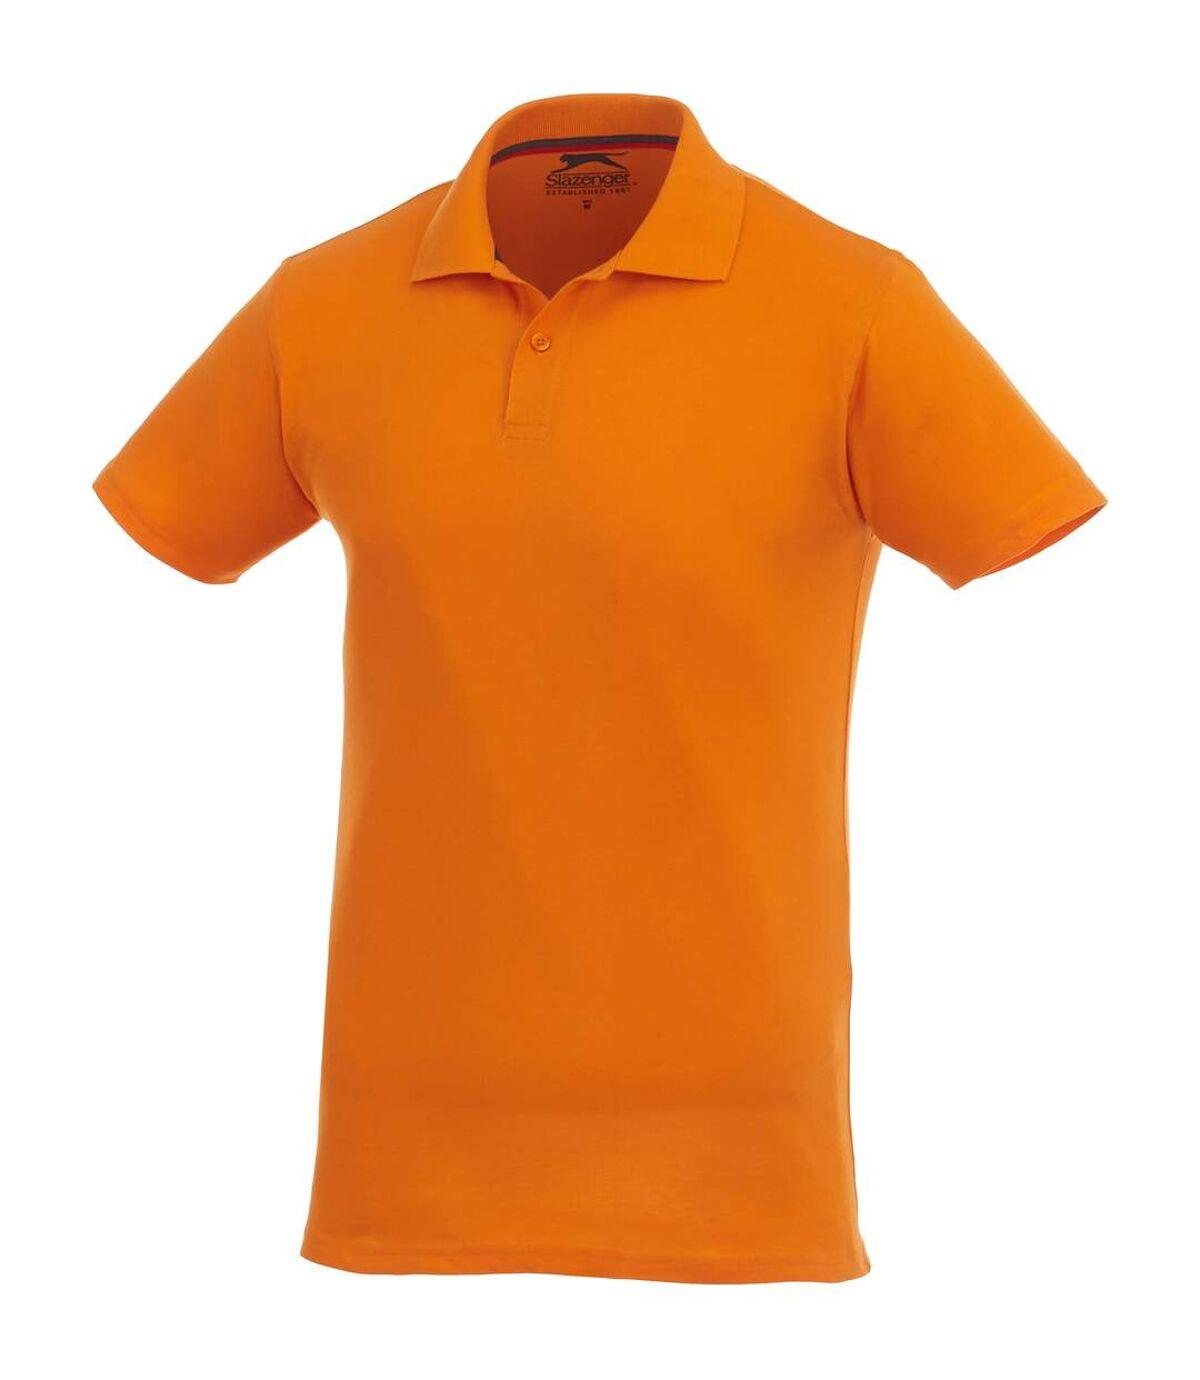 Slazenger Mens Advantage Short Sleeve Polo (Grey Melange) - UTPF1738